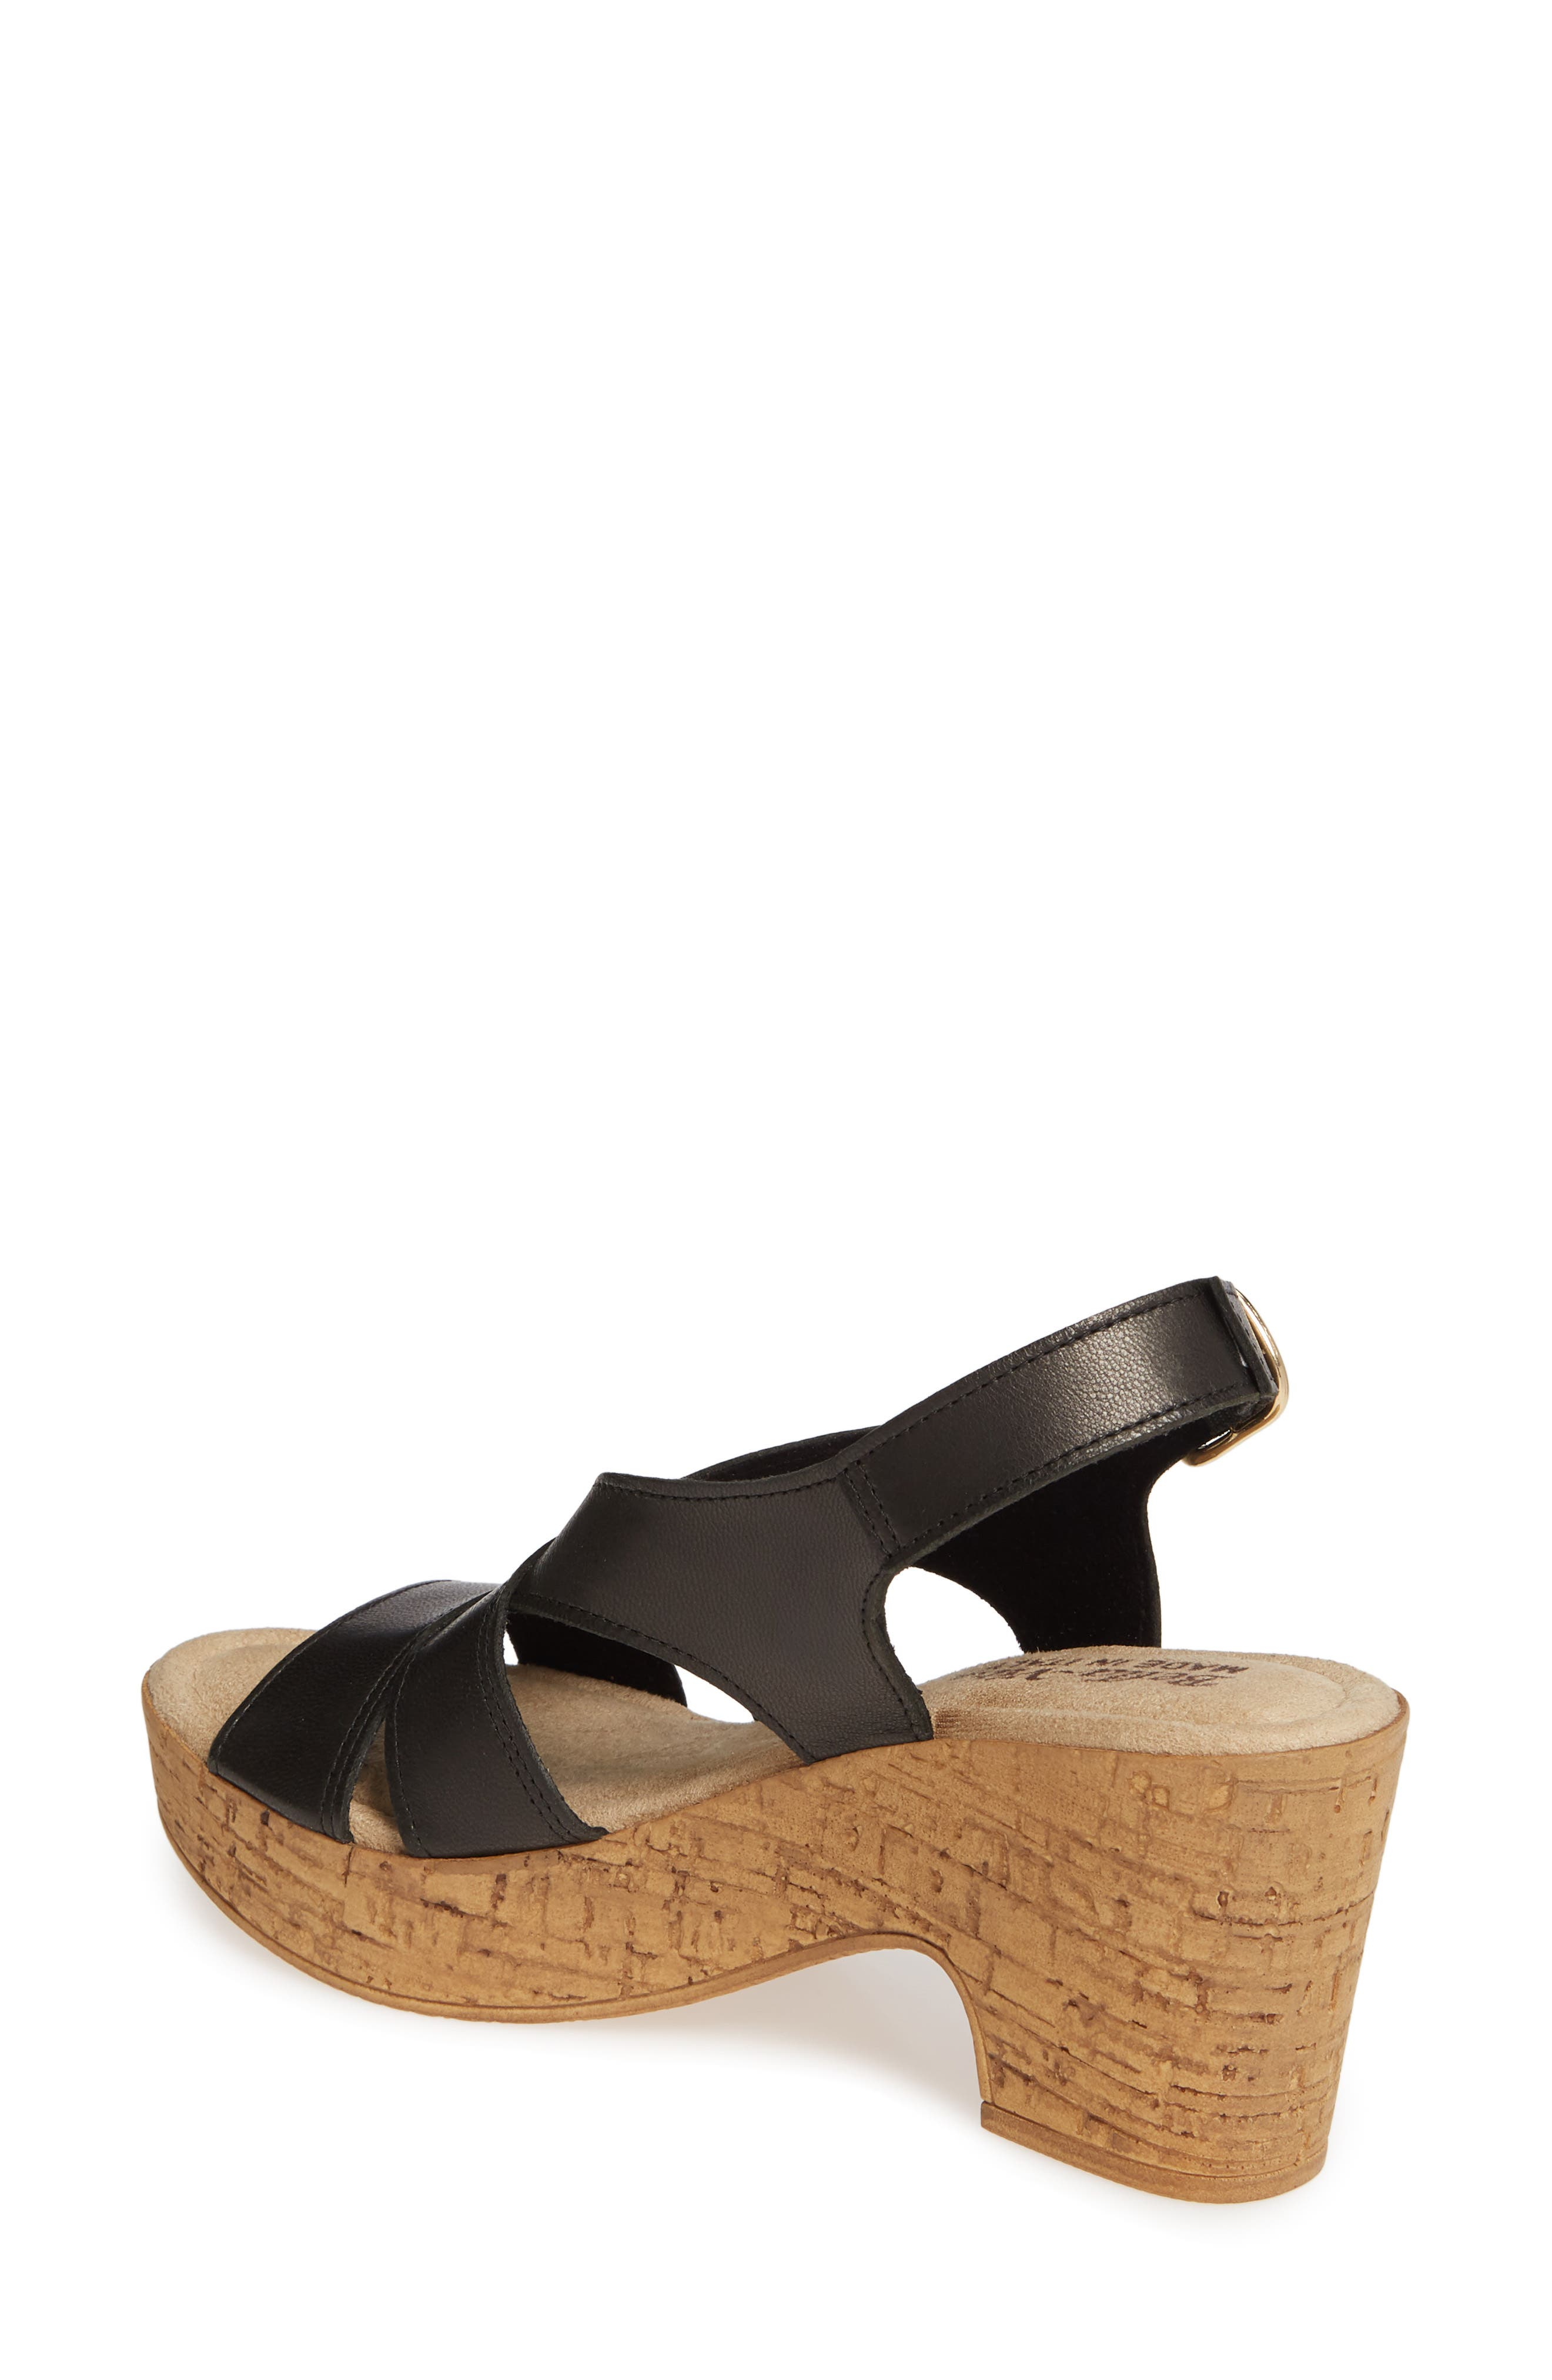 BELLA VITA, Jaz Platform Sandal, Alternate thumbnail 2, color, BLACK ITALIAN LEATHER